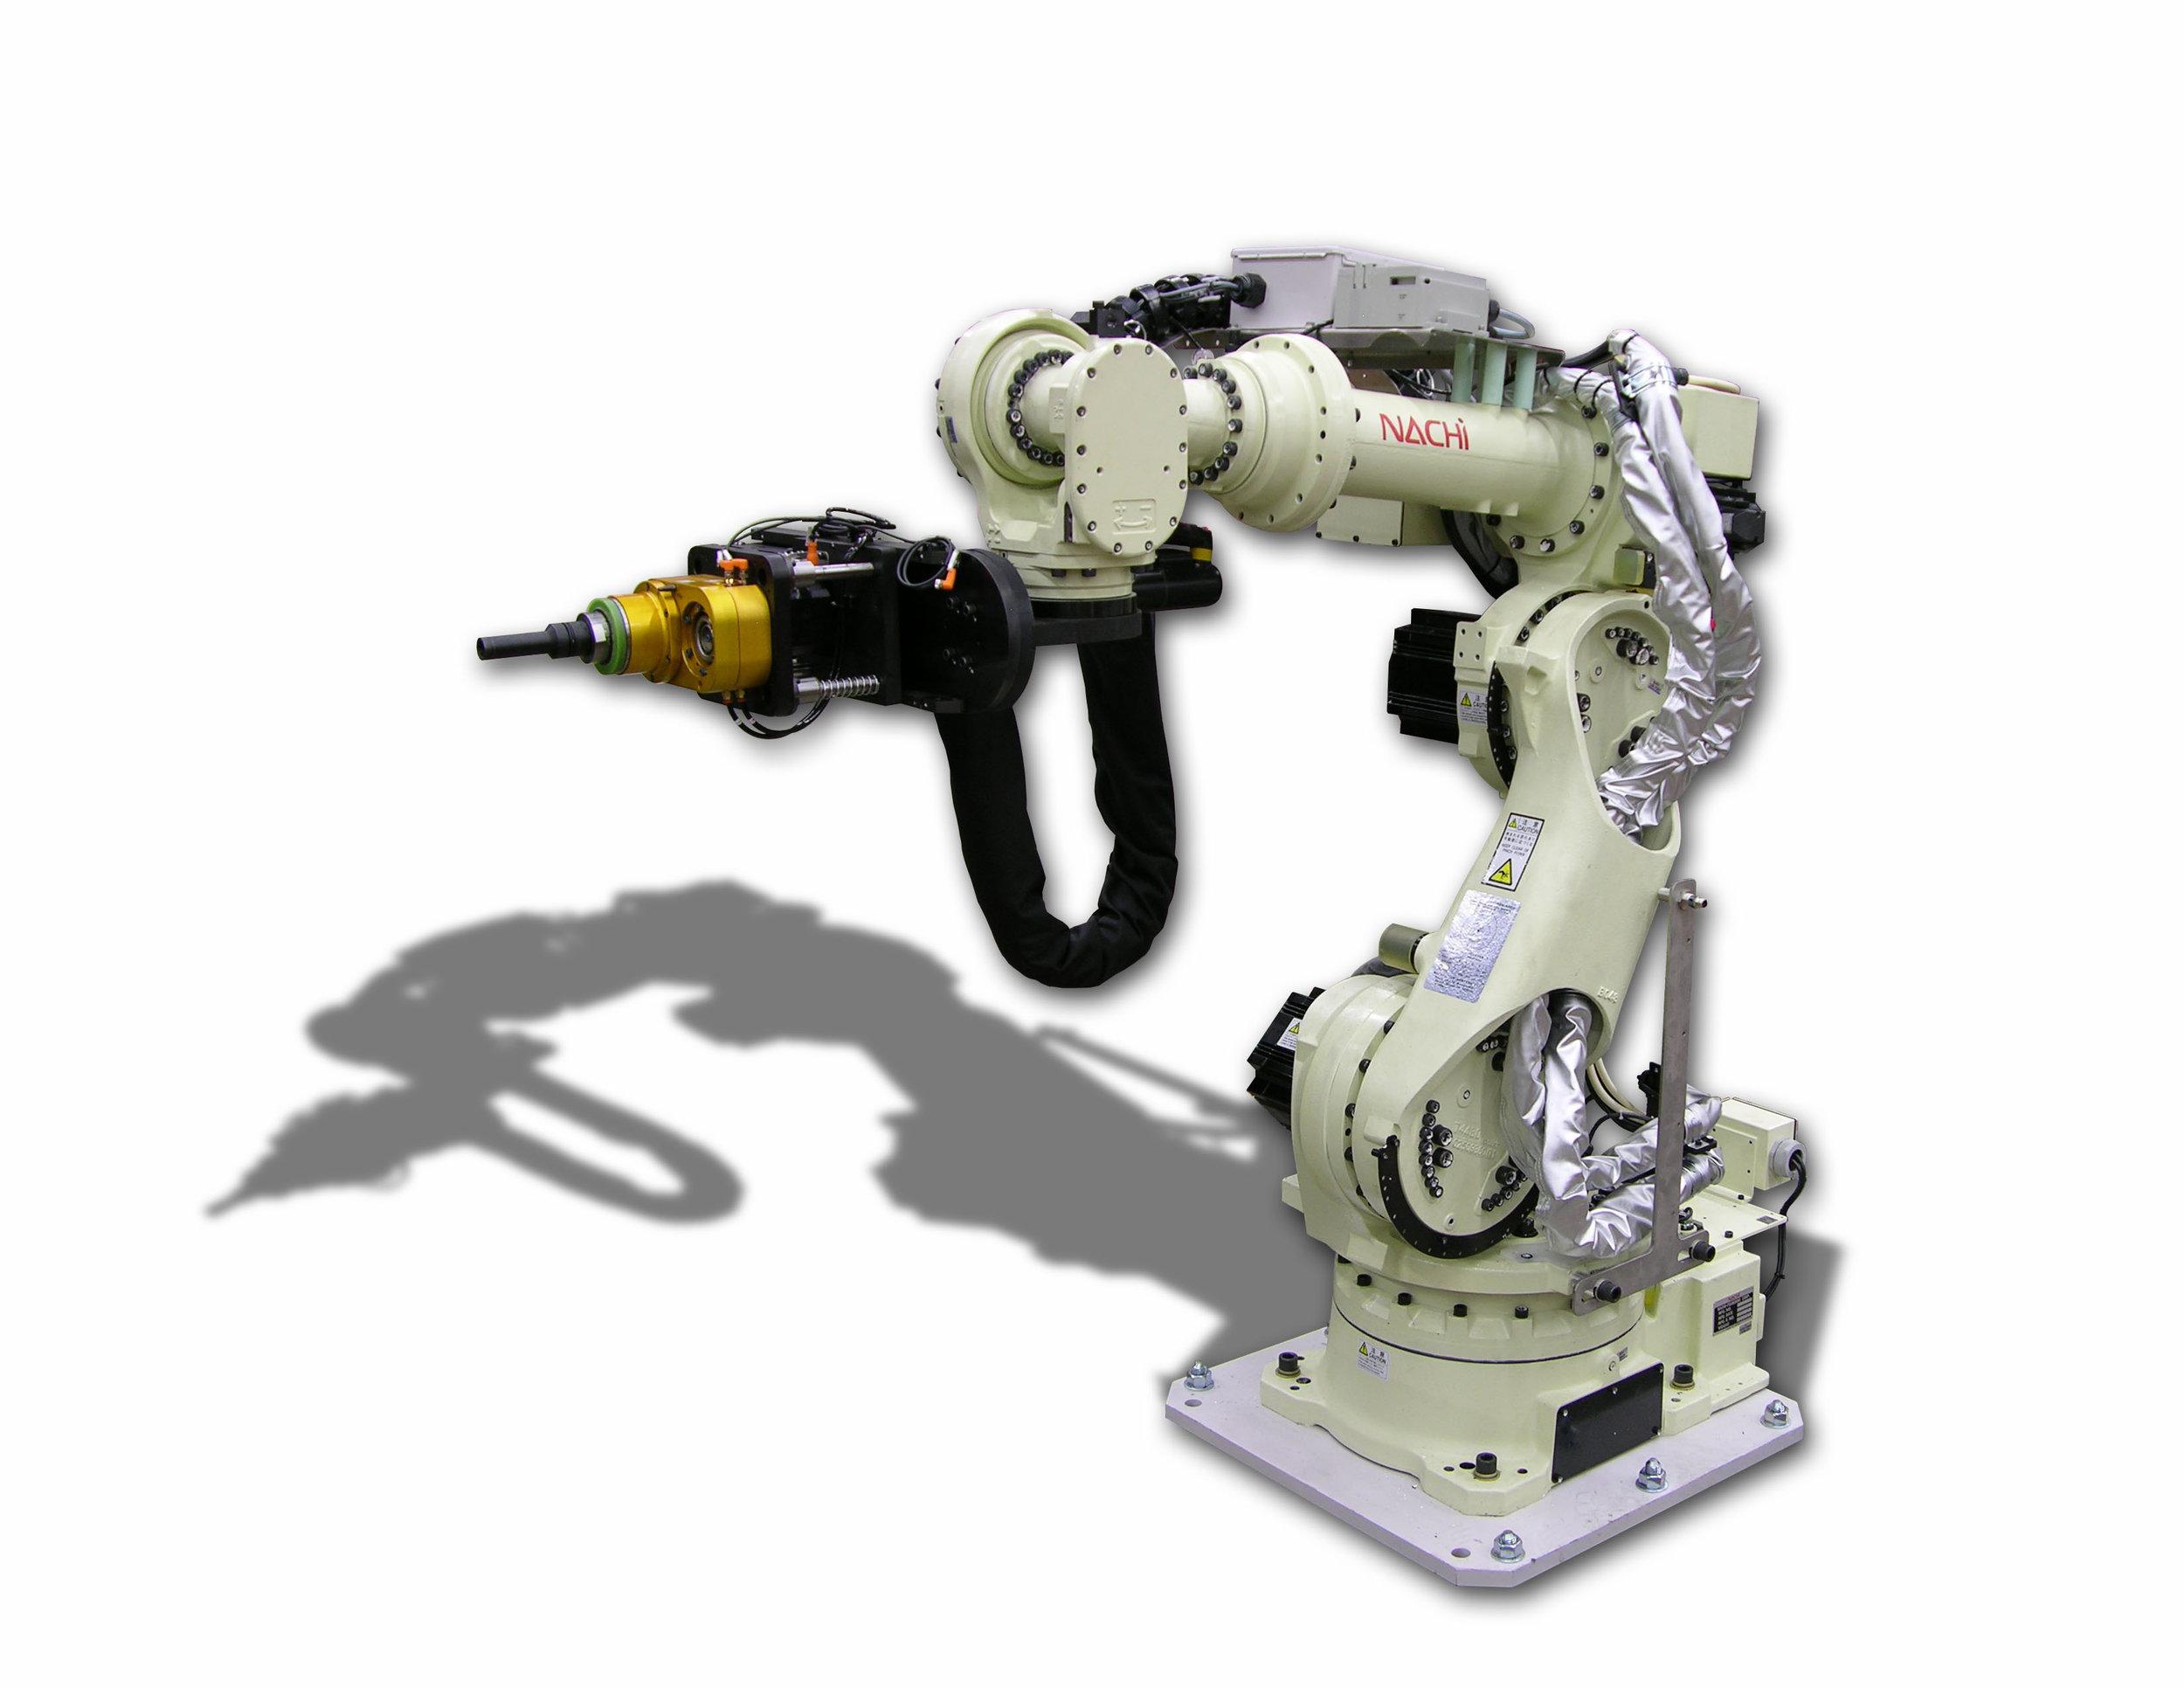 Cummins-Vib-Damp-Robot-1-8_5x11-With-Shadow-White.jpg